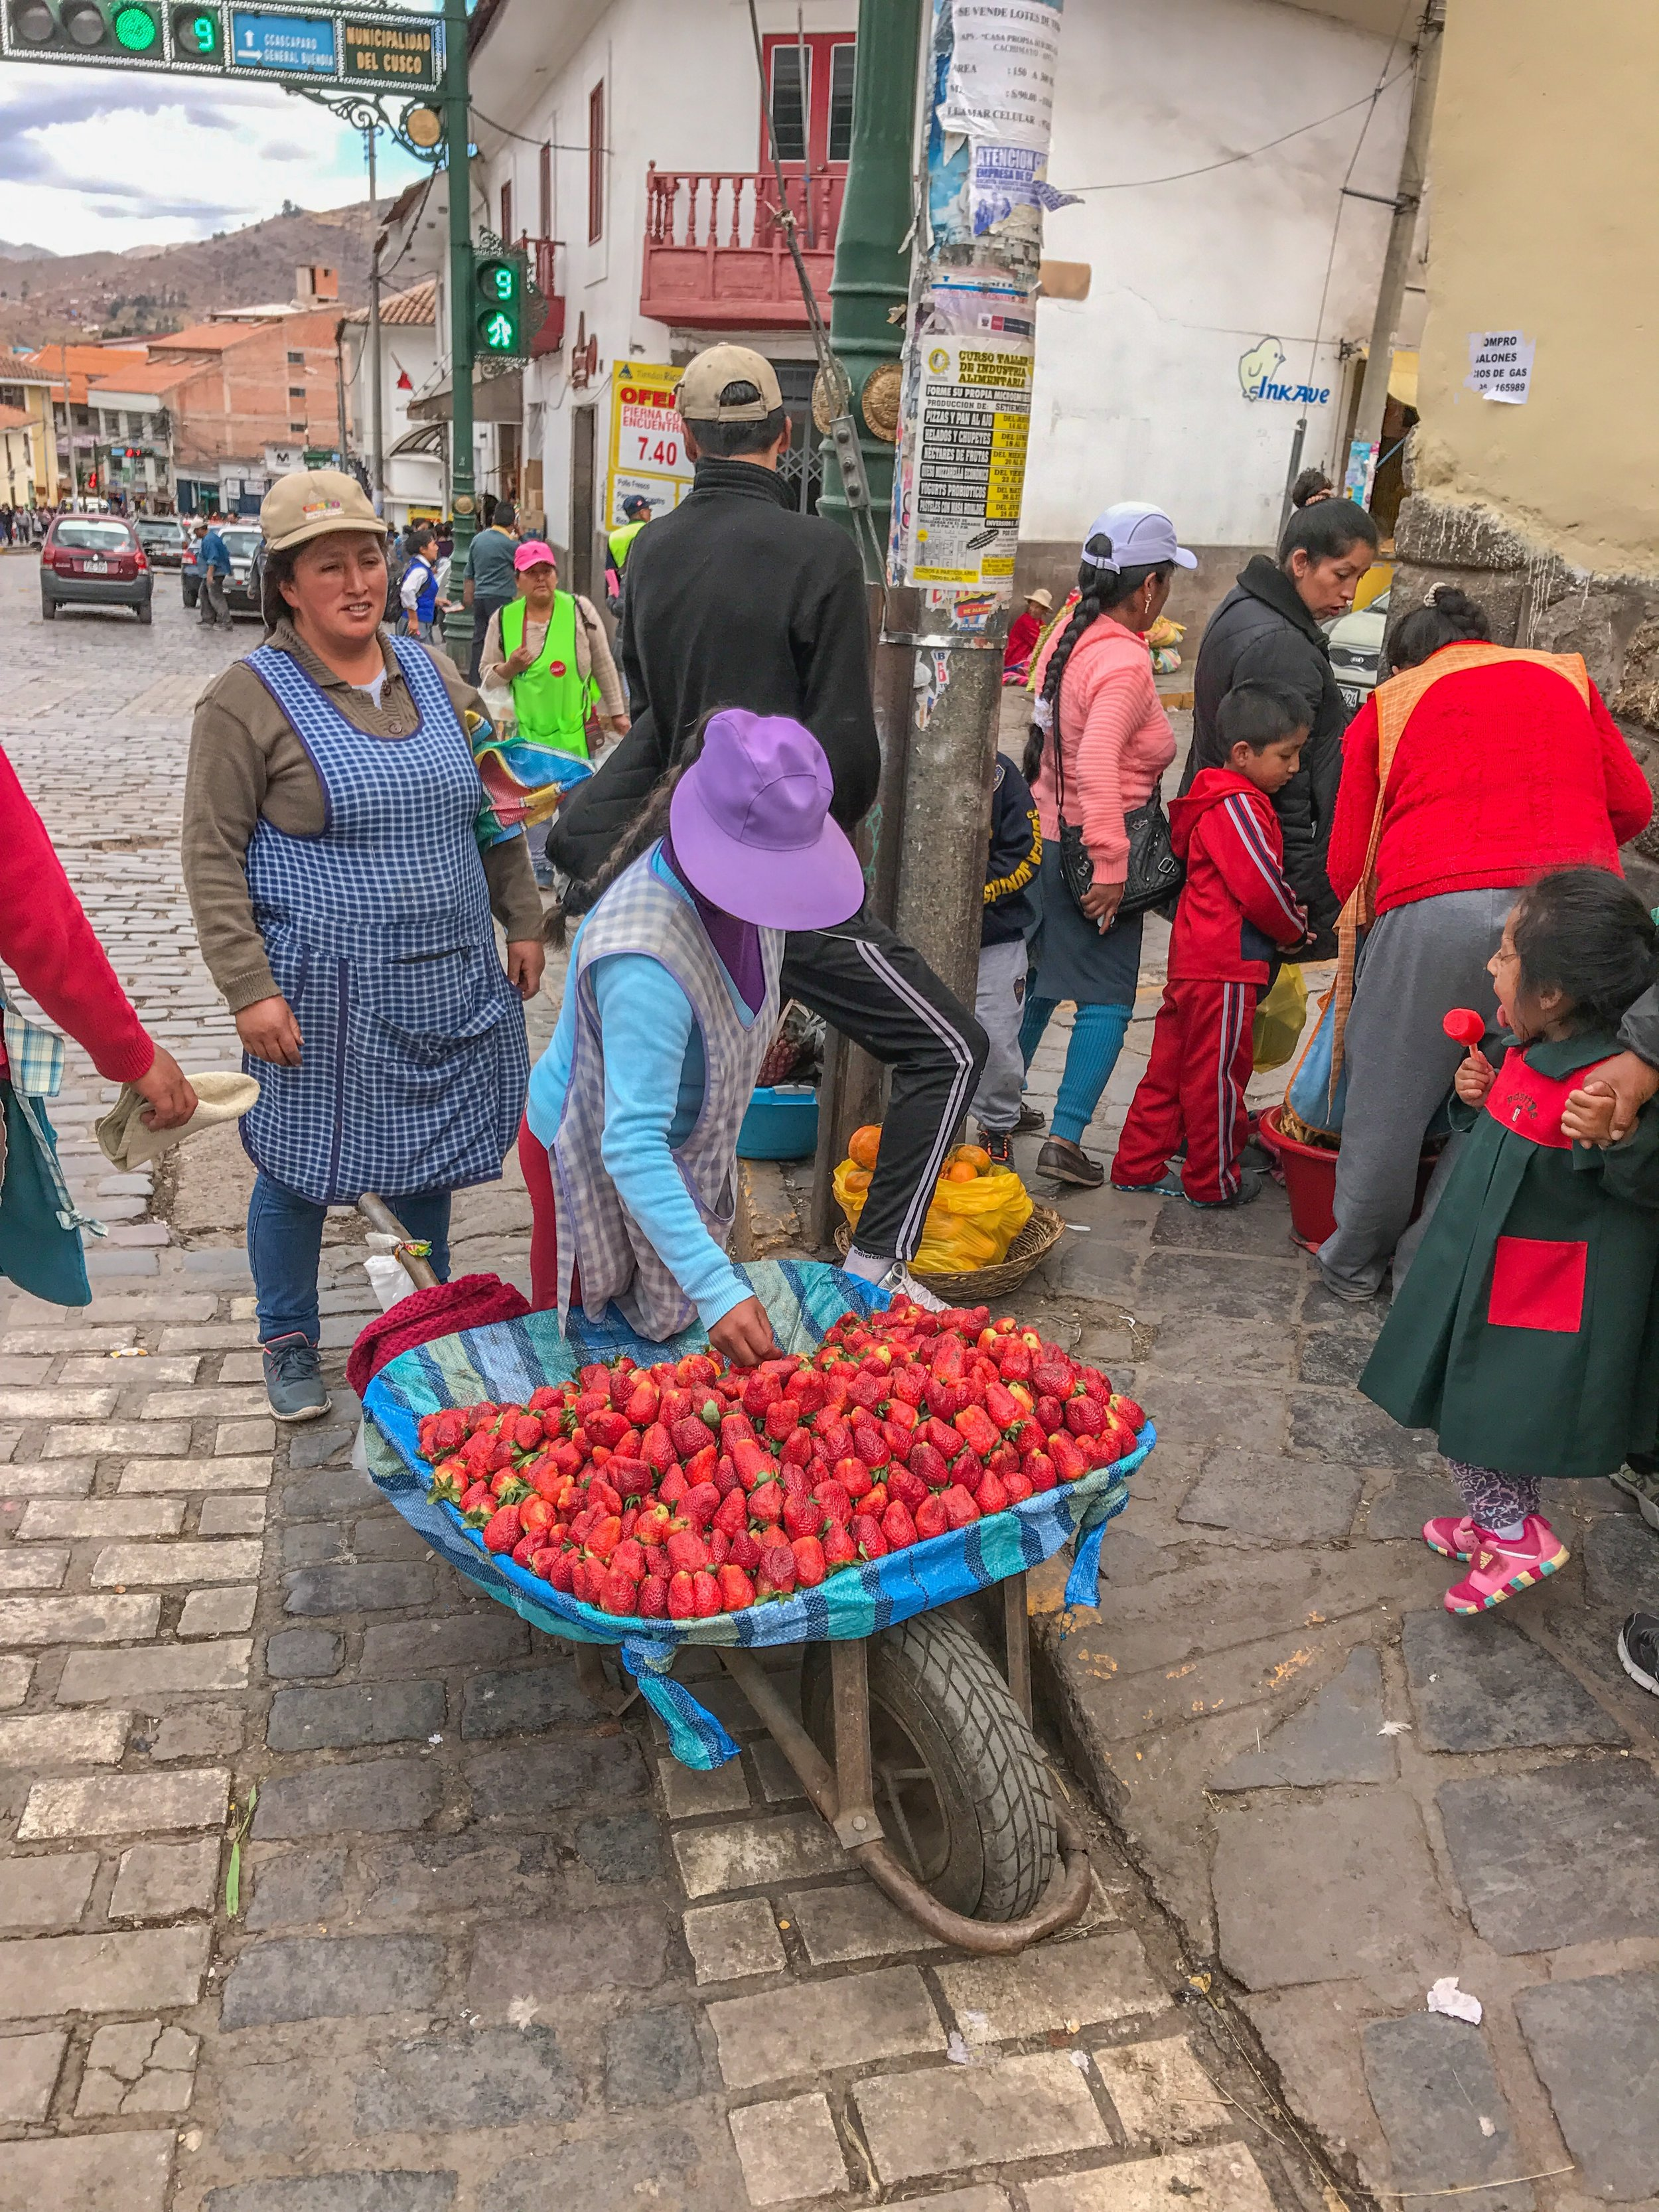 Berries sold outside San Pedro Market